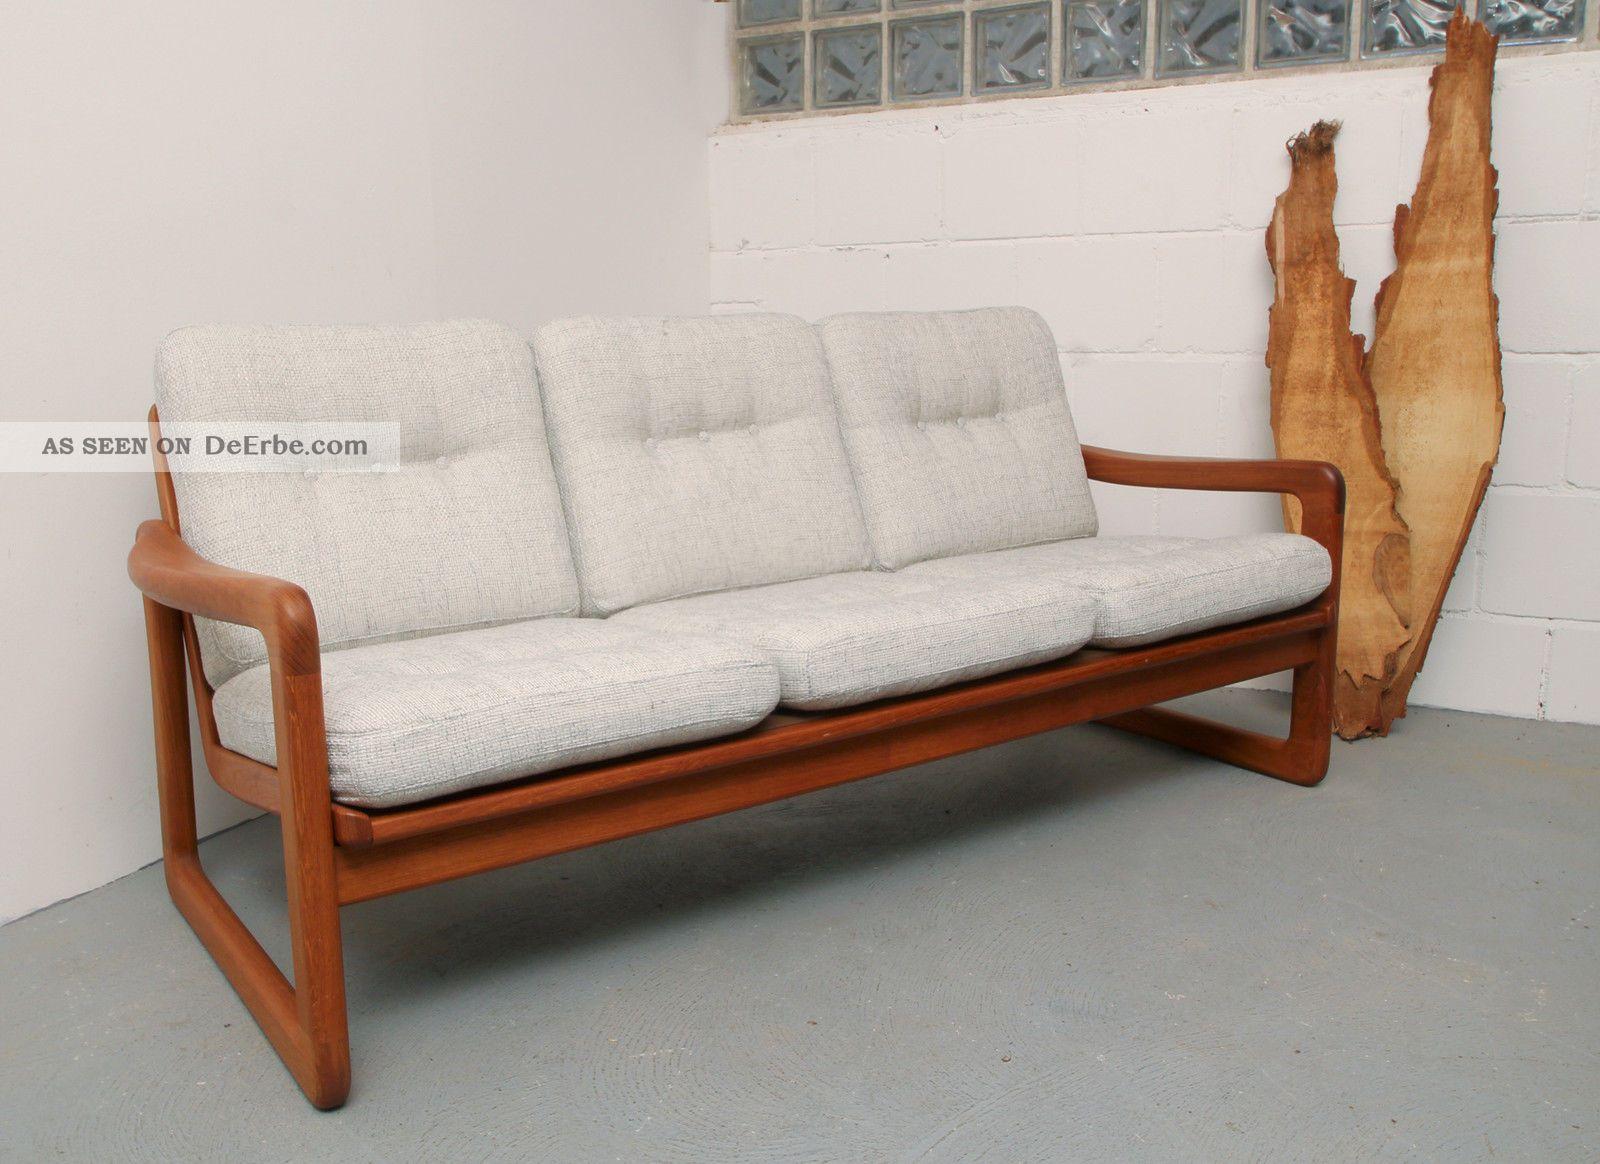 60er sofa teak massiv juul kristensen bezogen. Black Bedroom Furniture Sets. Home Design Ideas